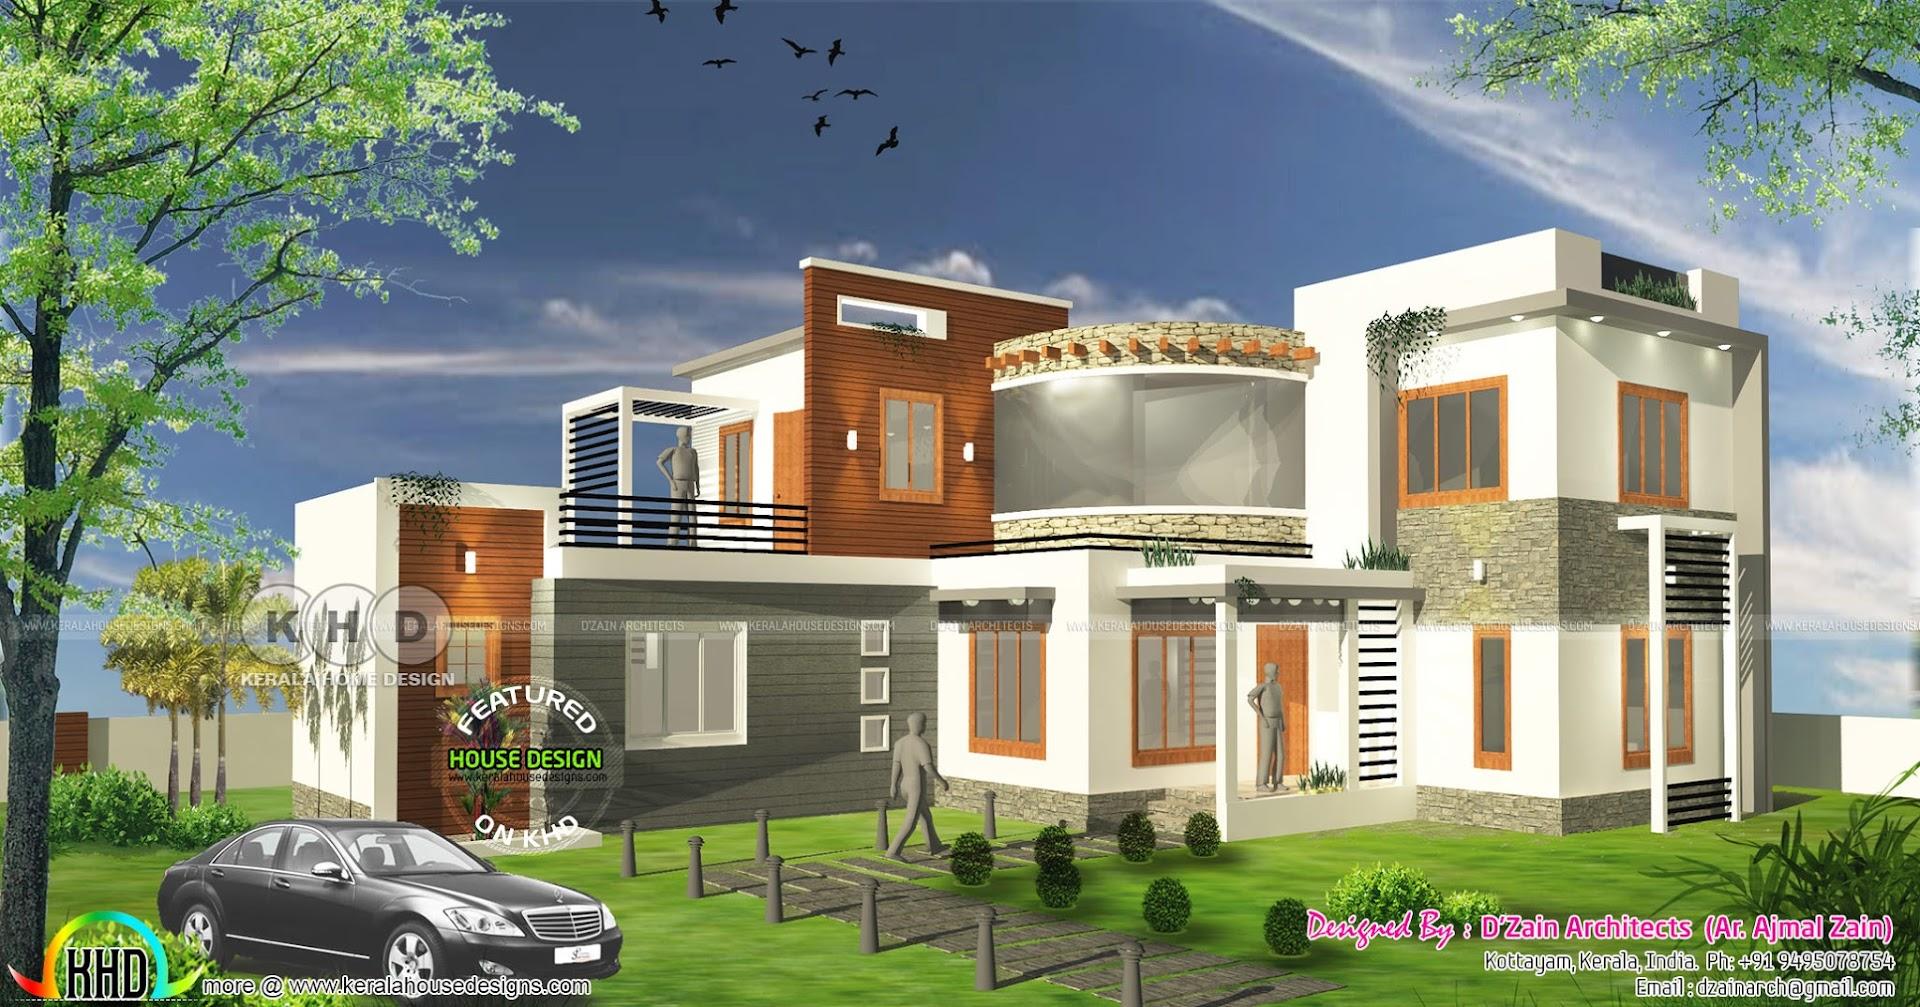 4 bhk modern contemporary home 1800 square feet kerala for 4 bhk home design